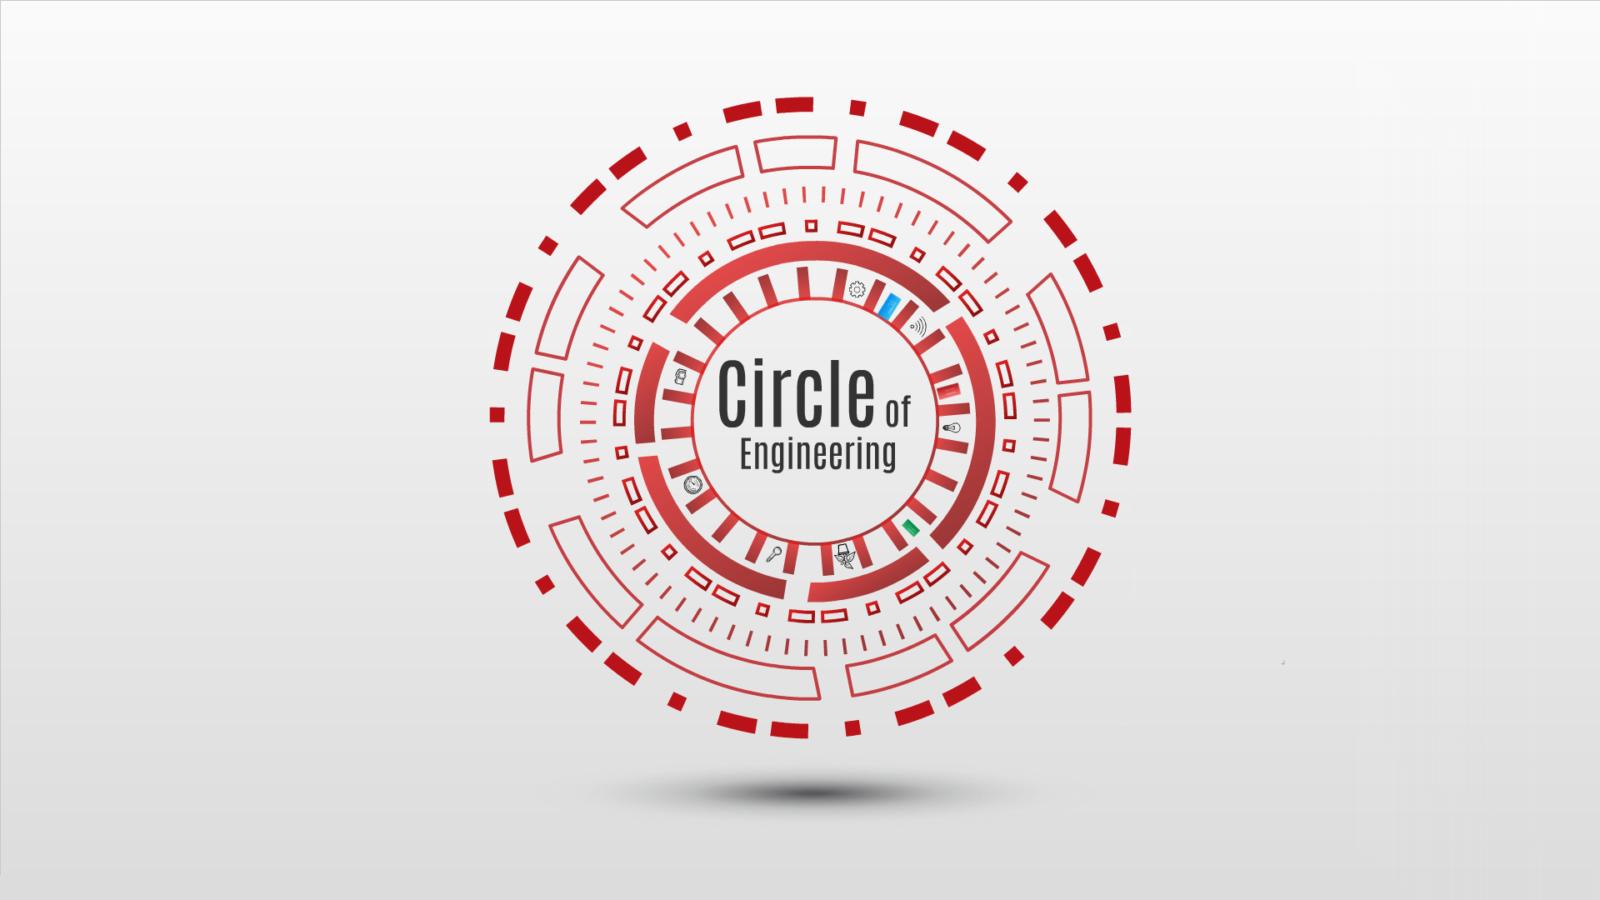 Circle of Engineering Prezi template